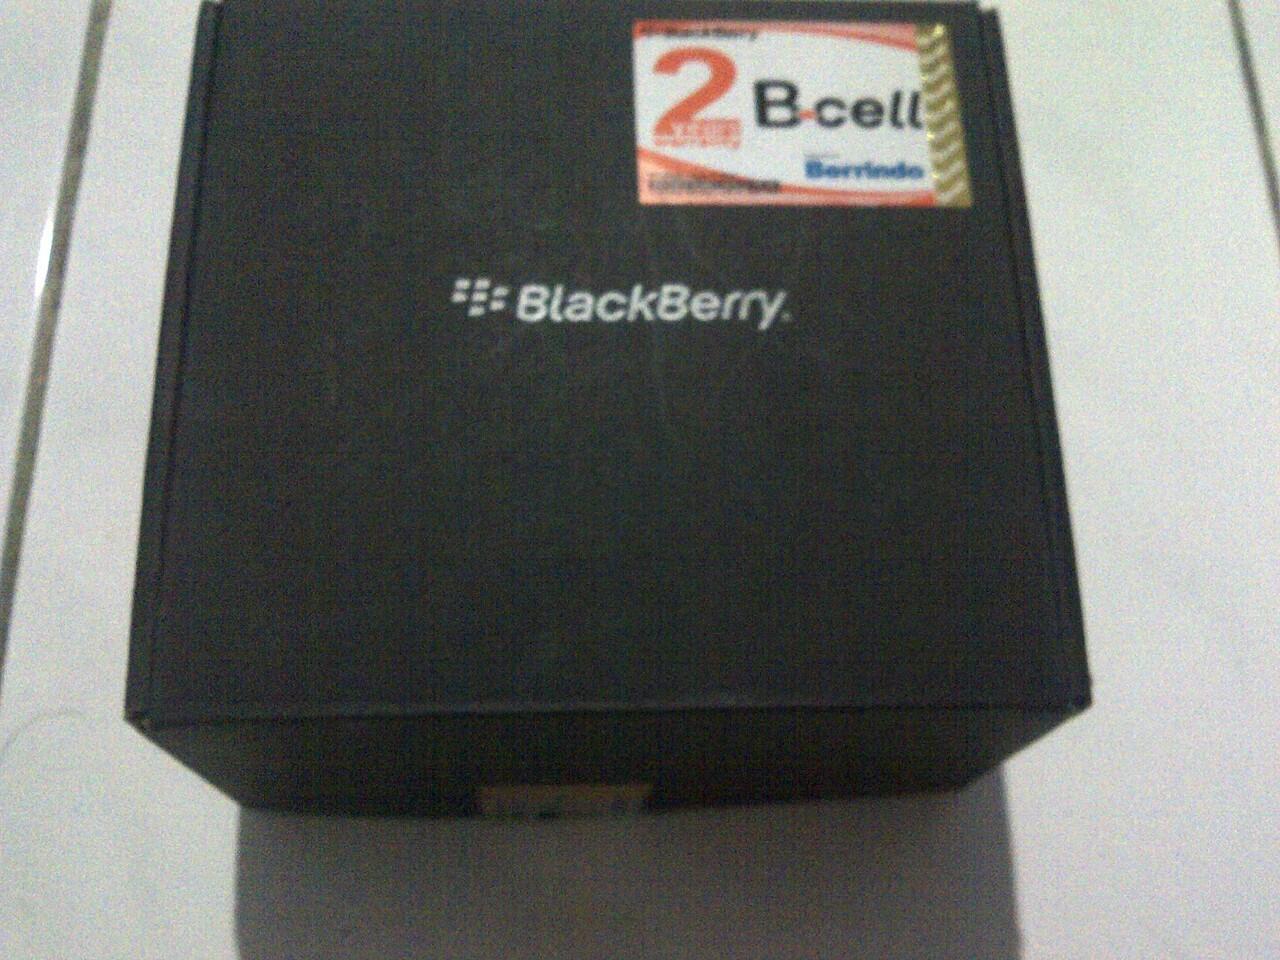 WTS: Blackberry Onyx 2 9780 Mulus Grs Berrindo Bcel 2 Mingguan